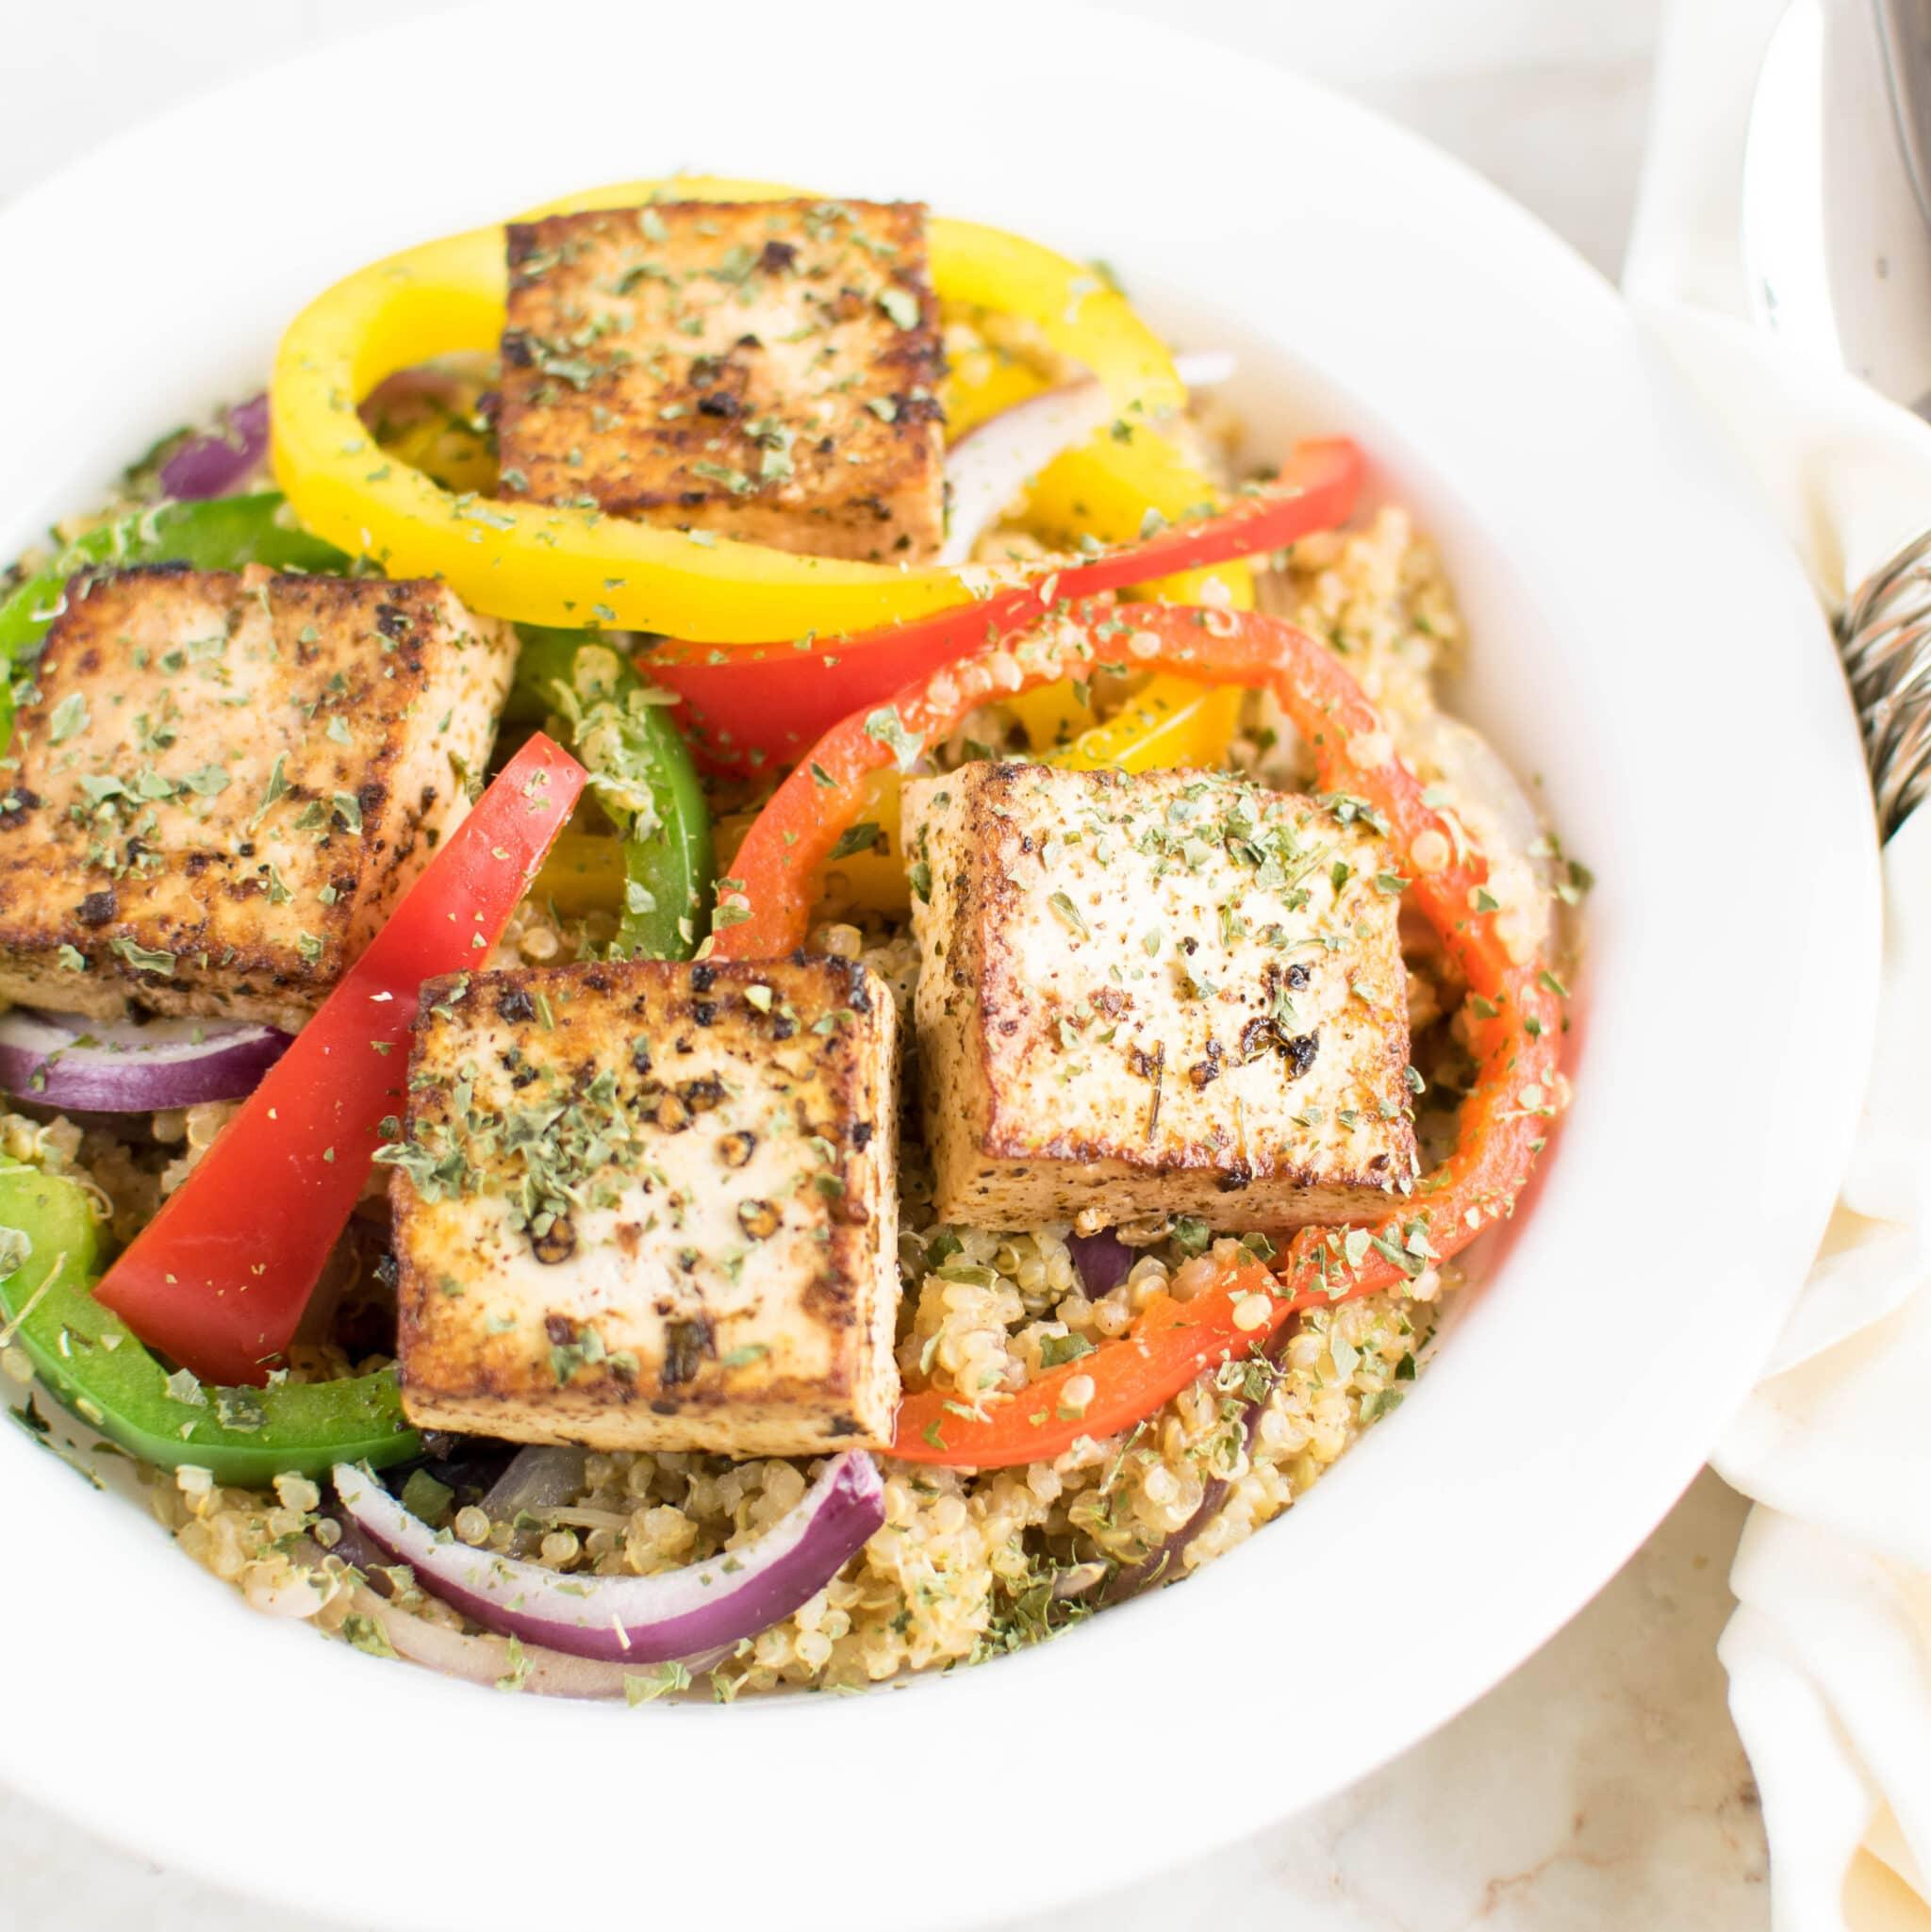 Red Wine Vinegar Tofu with Quinoa | 30 minutes vegan and gluten free ...